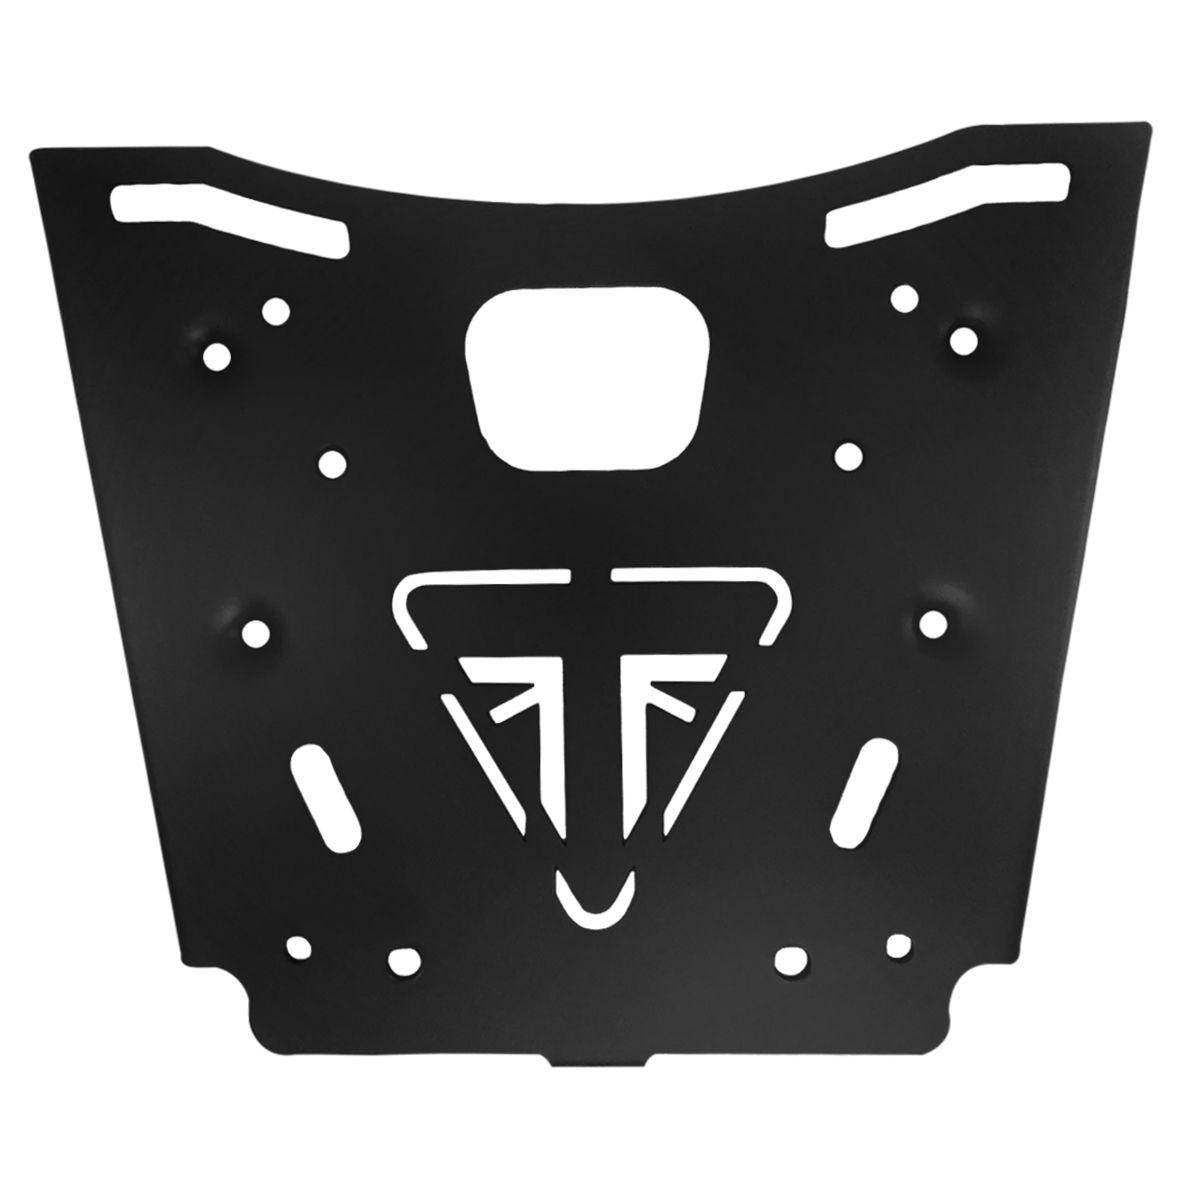 Bauleto Tiger 800 43L Fibra de Carbono Bráz Acessórios  - Motorshopp